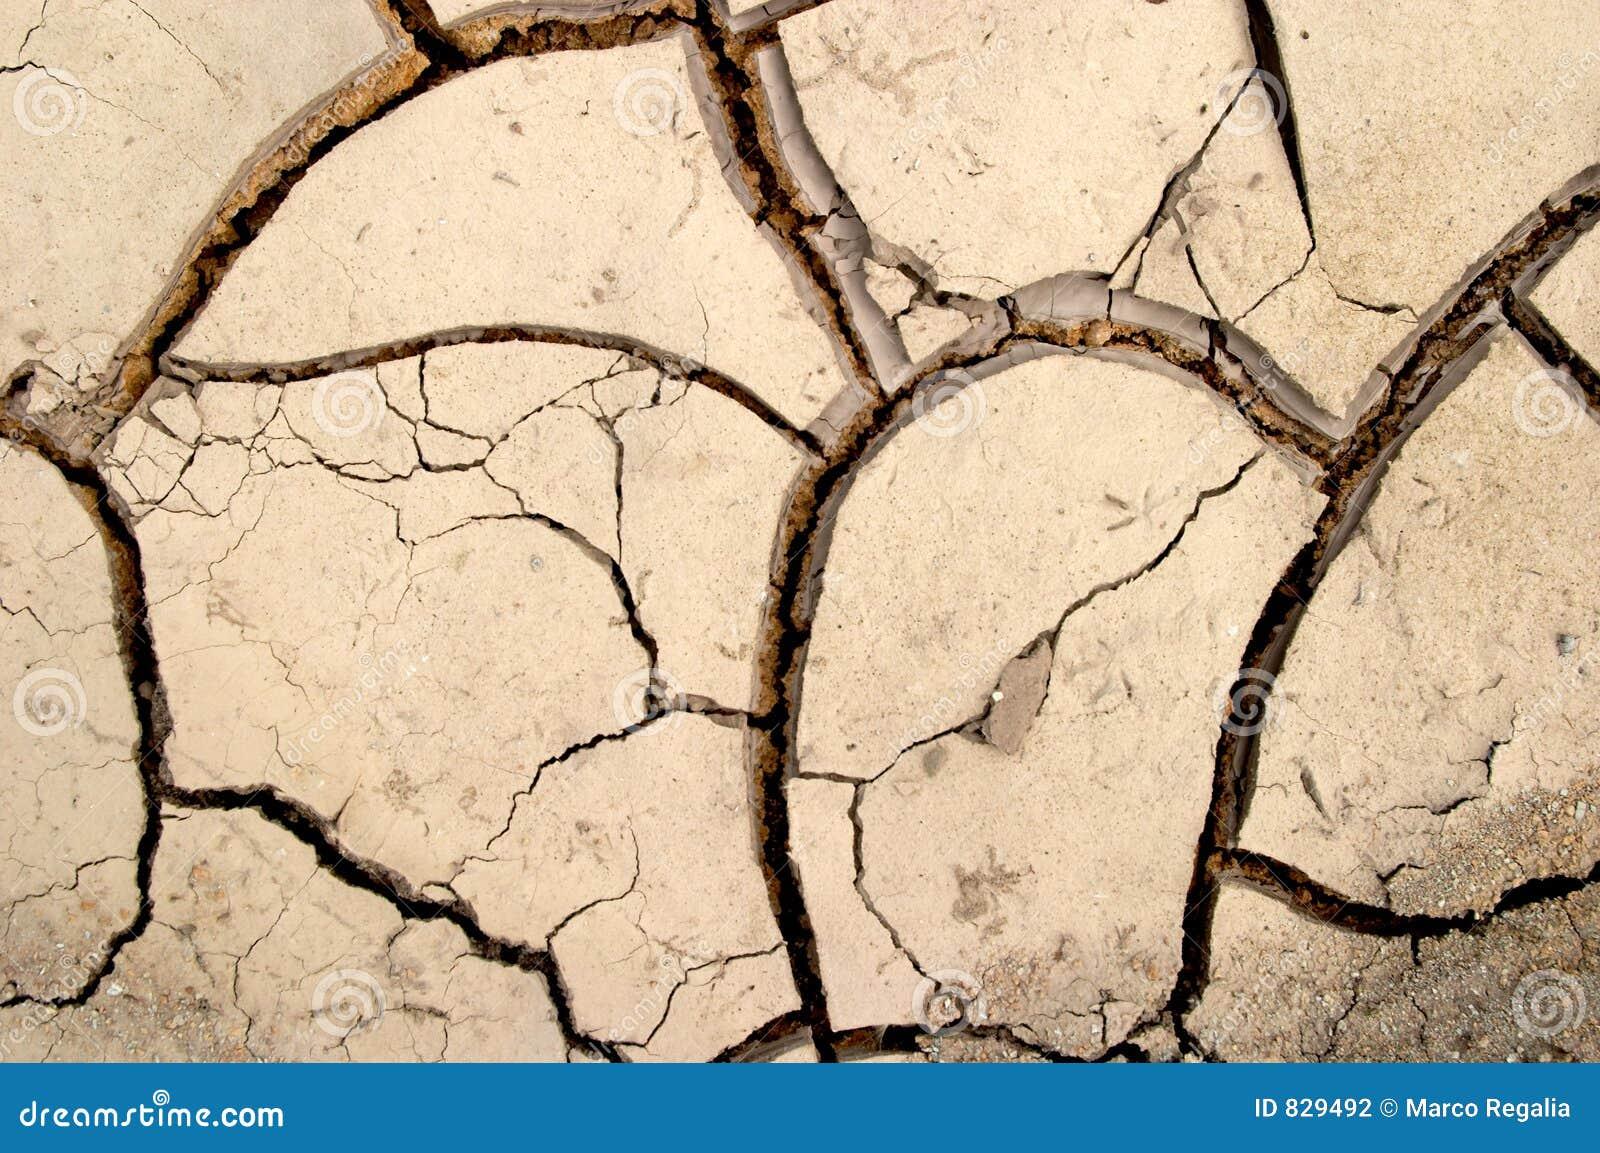 Dry mud cracks texture